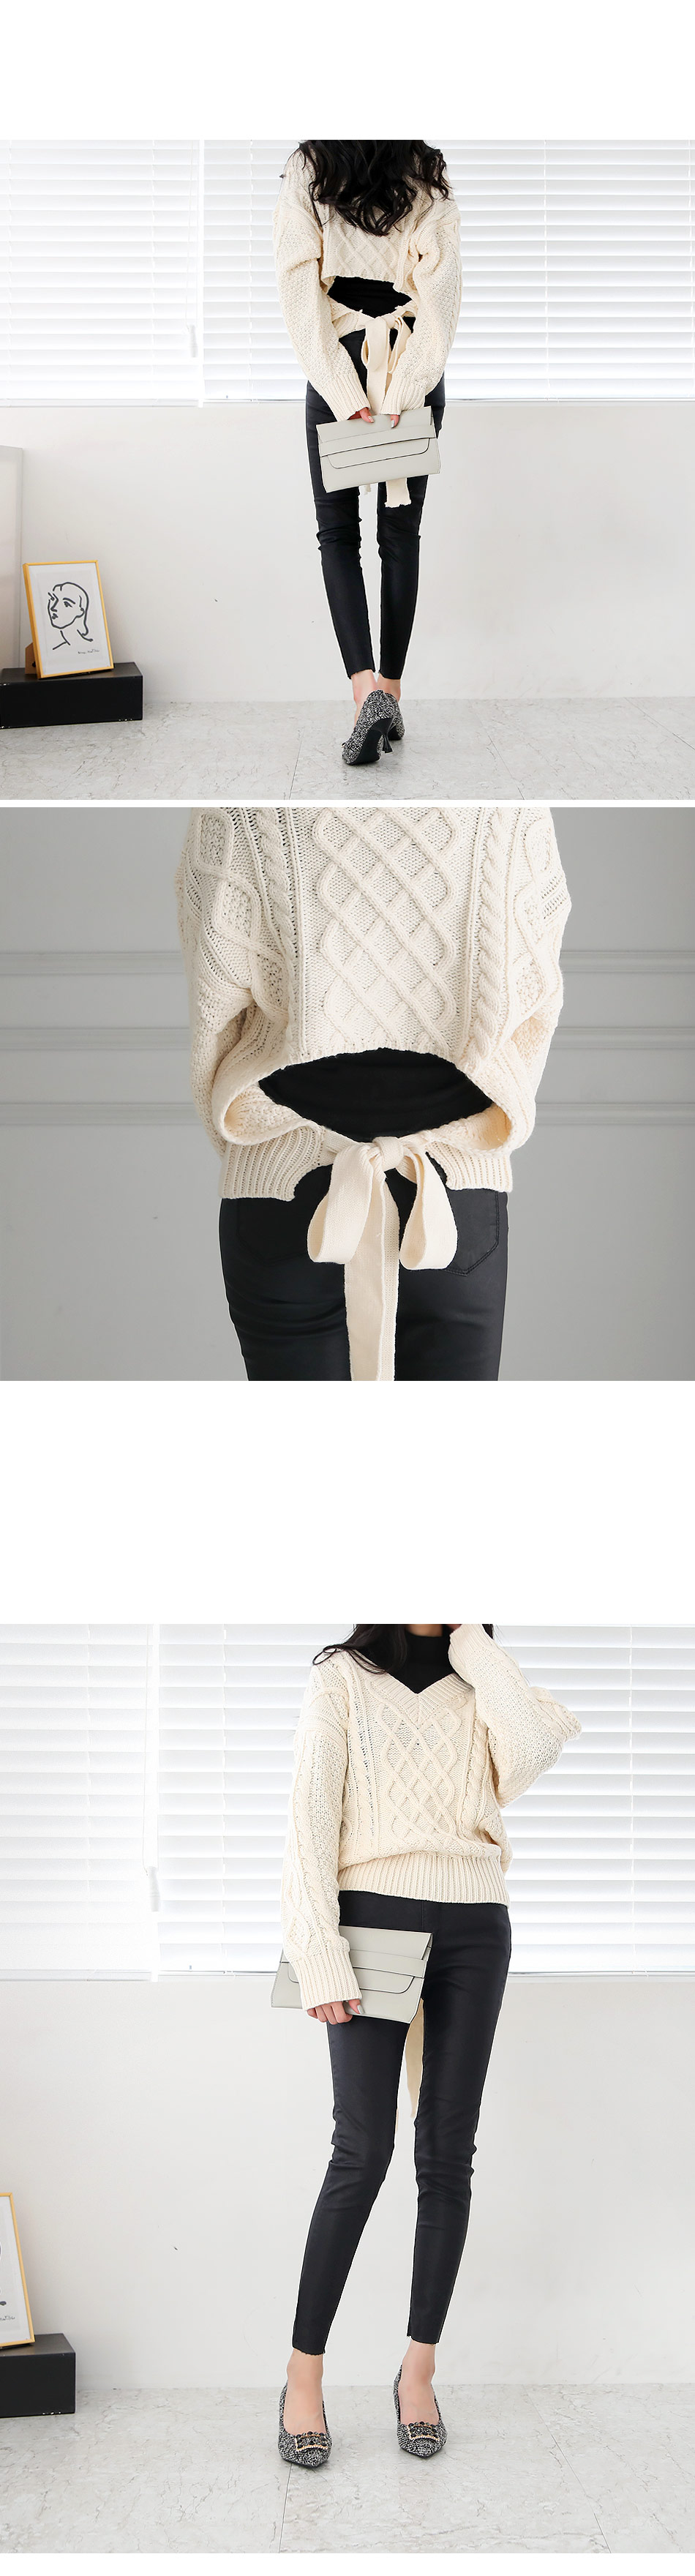 Webens backpoint knit